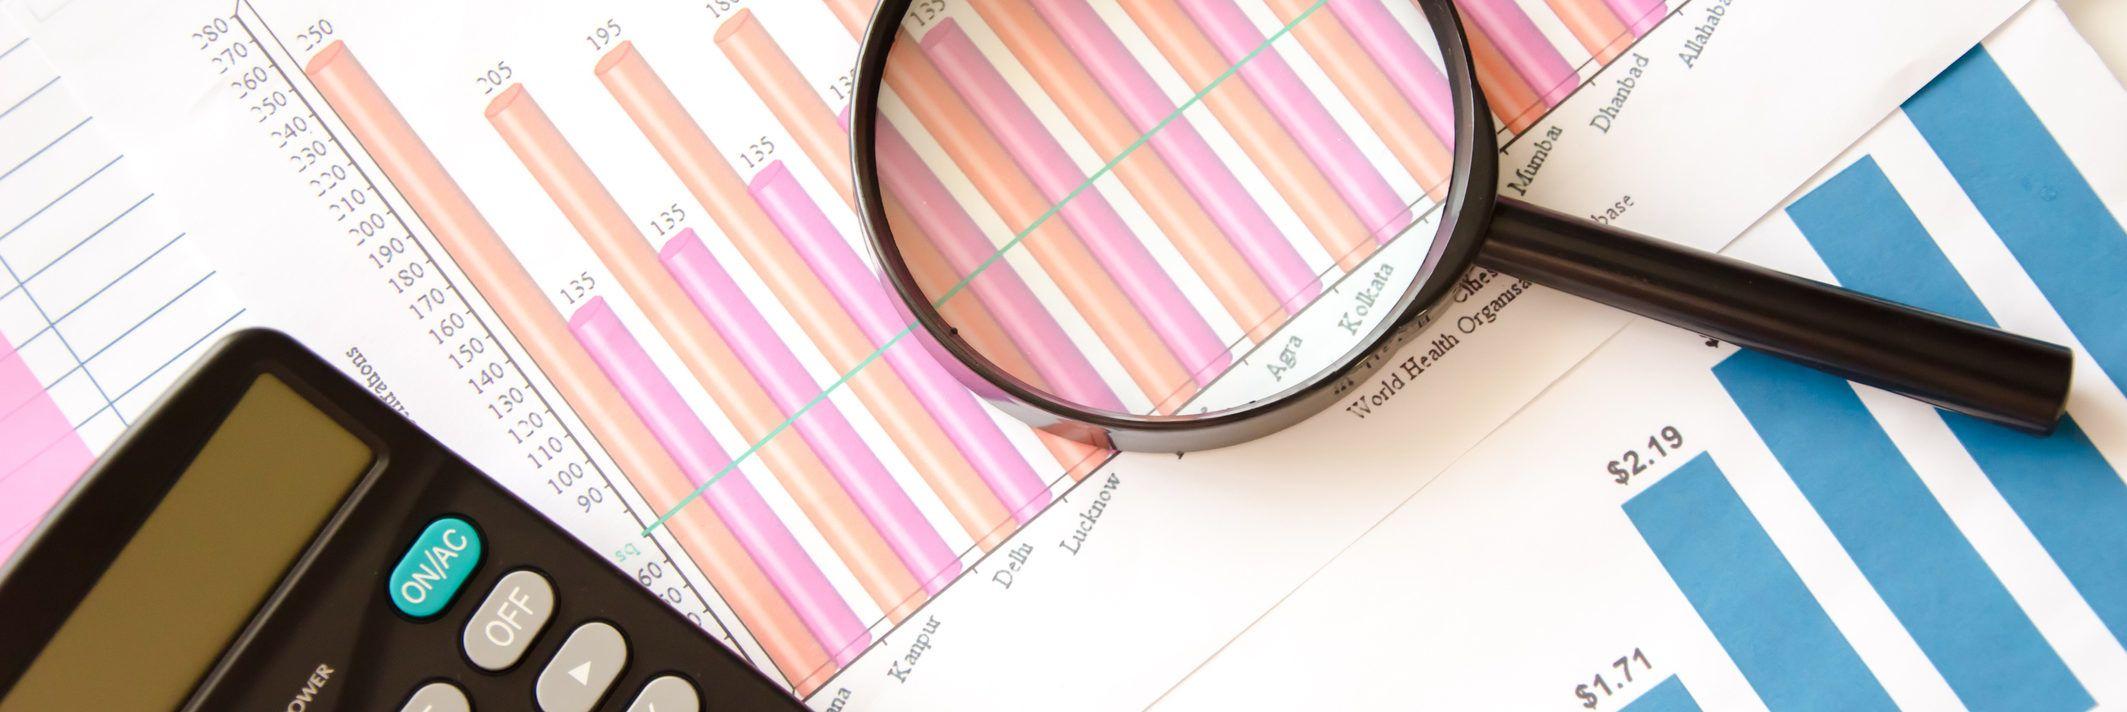 main image - Revenue & Financial Budgeting, Monitoring & Forecasts